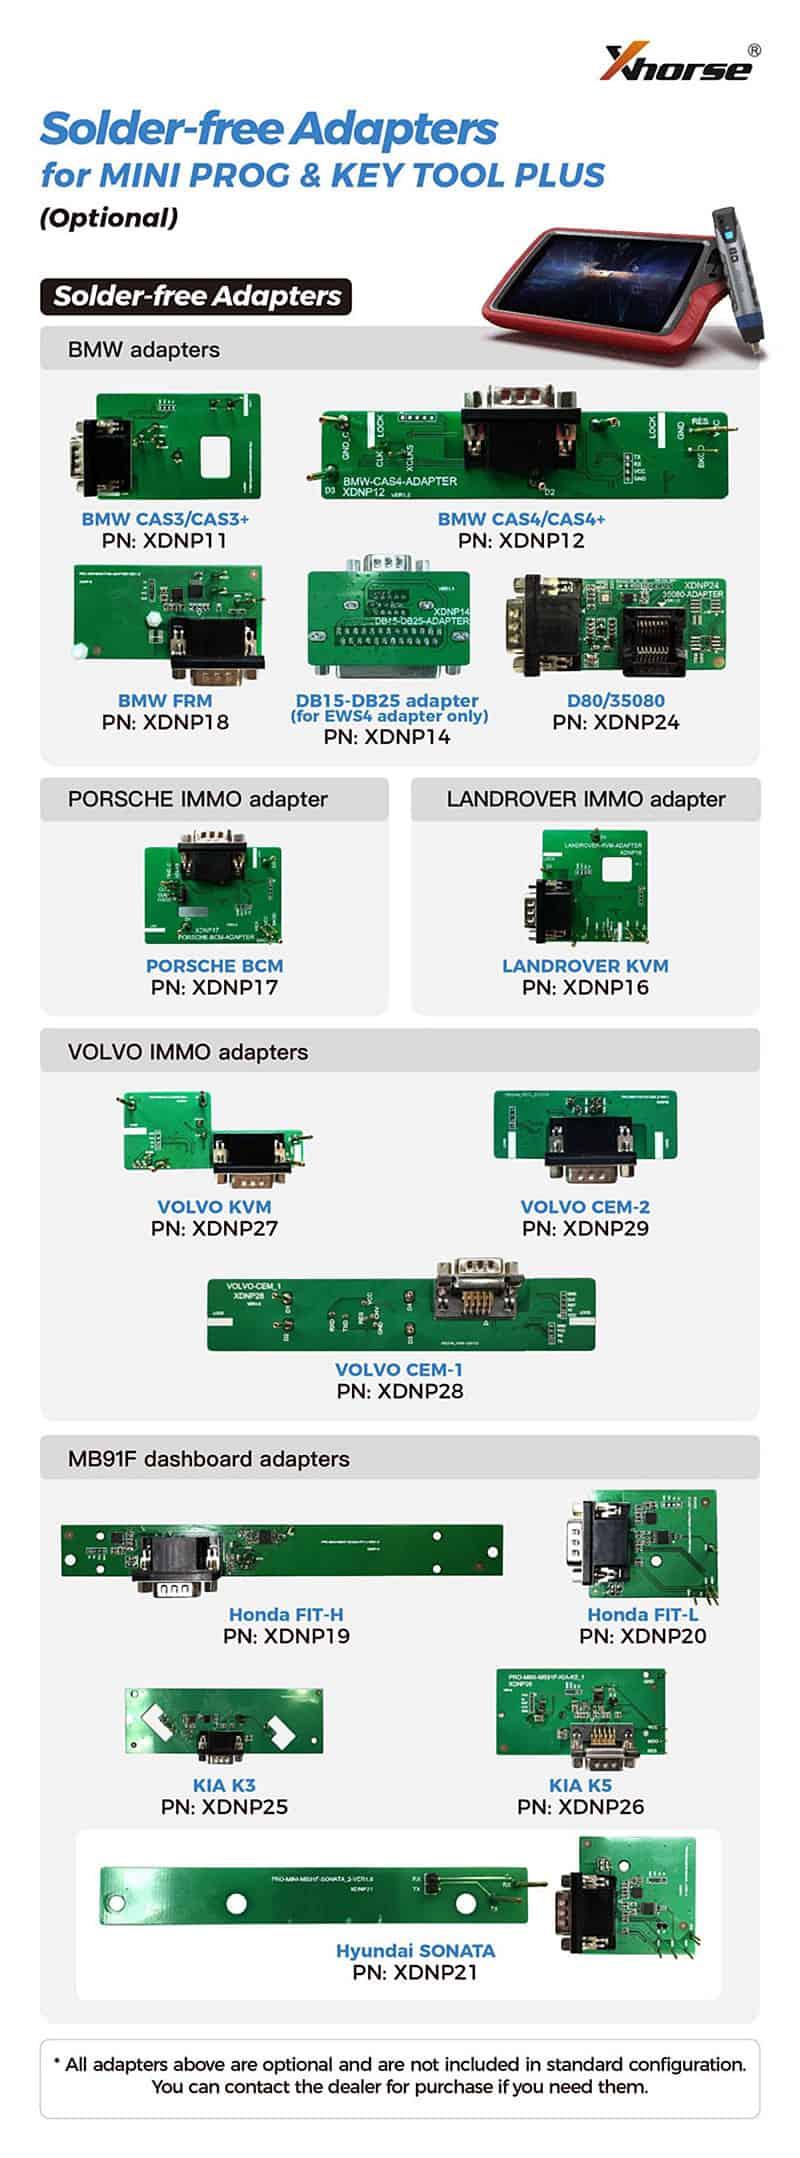 solder-free-adapters-vvdi-prog-key-tool-plus-15pcs-800